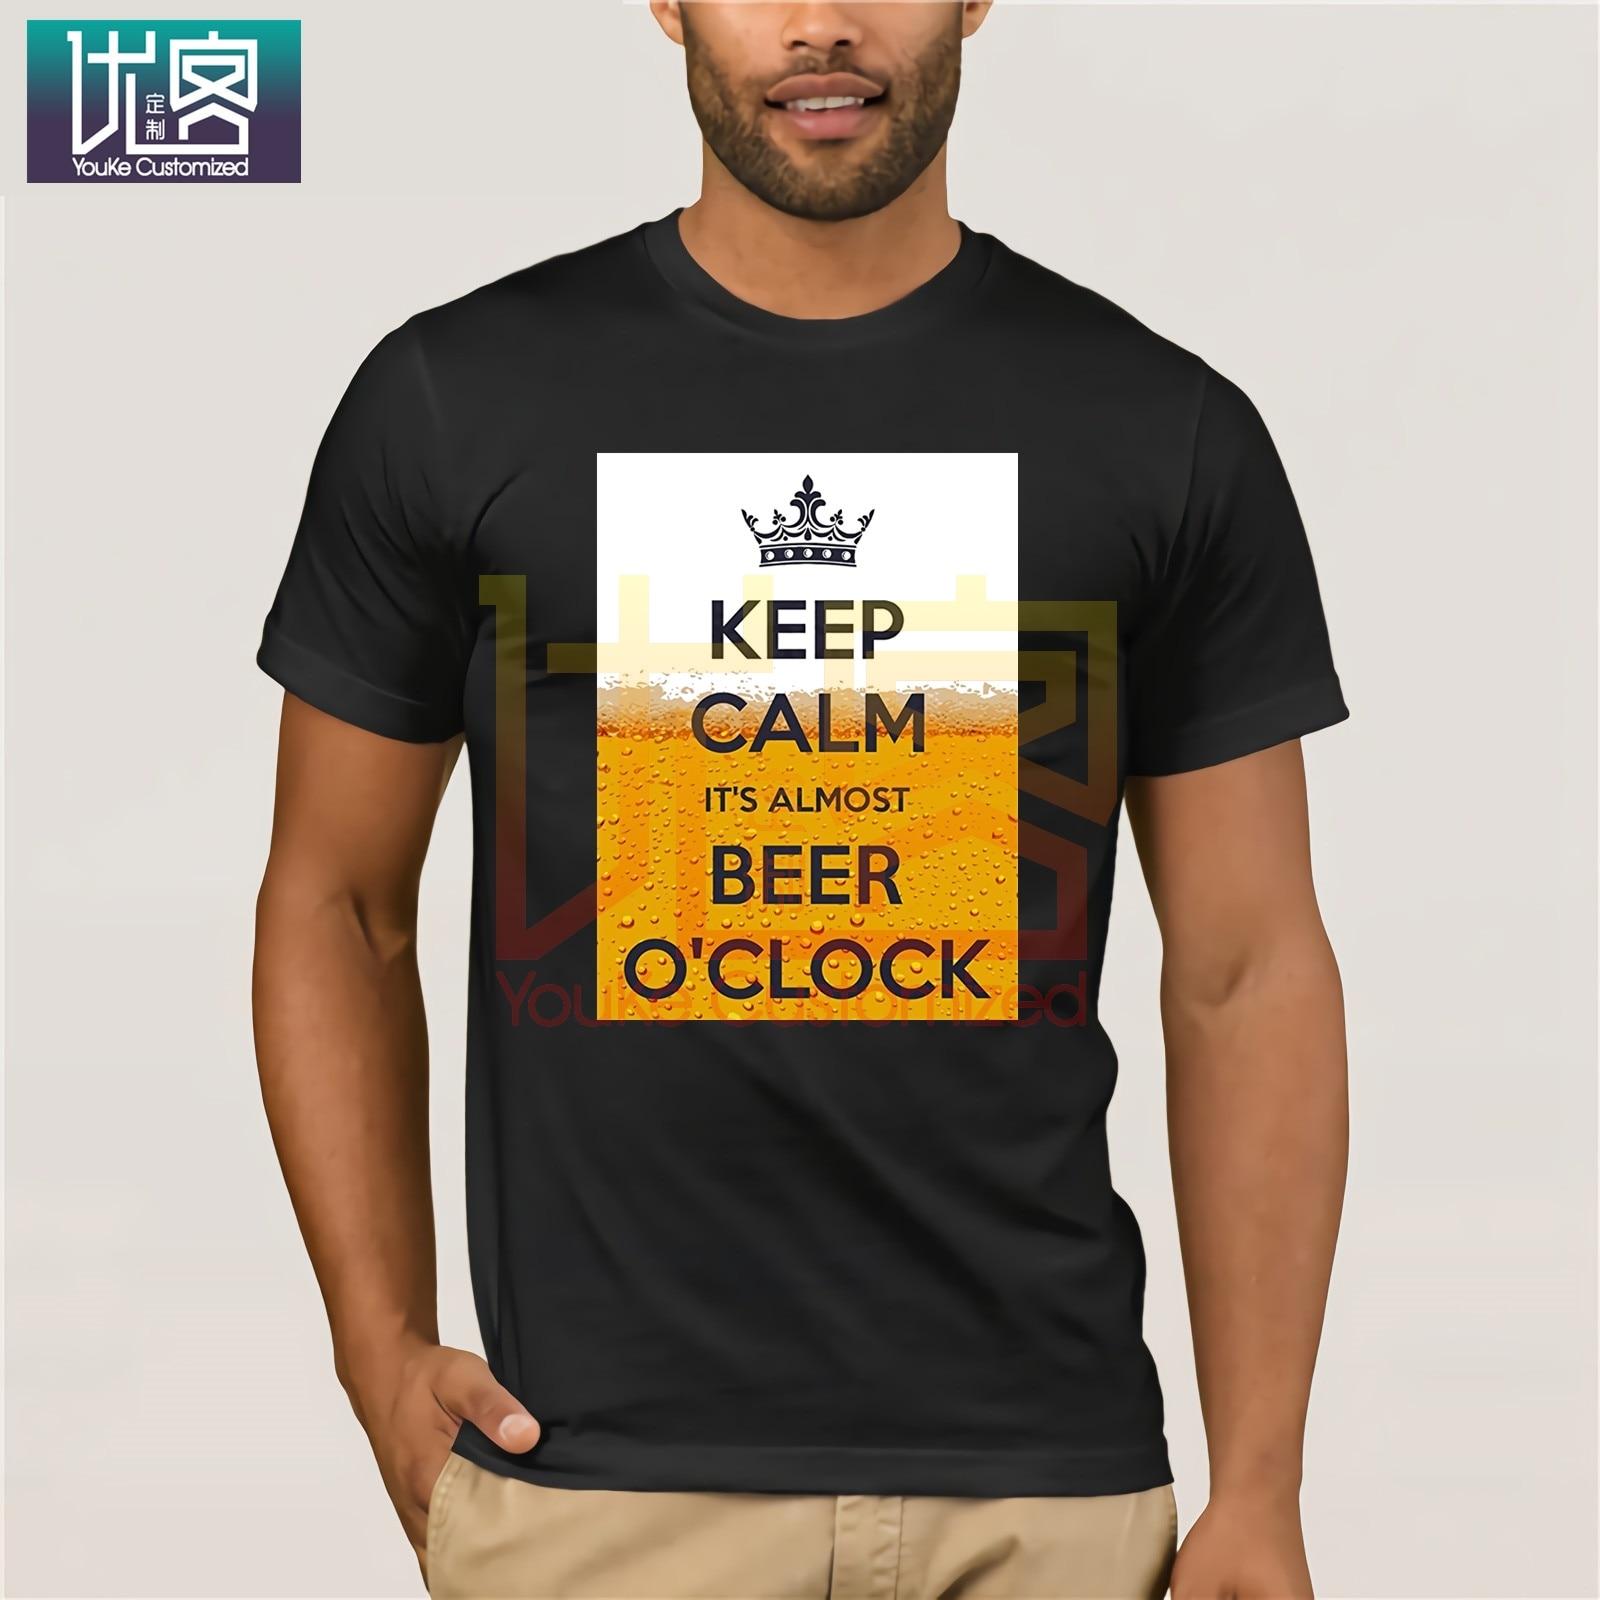 Camiseta de manga corta para hombre Keep Calm Its always Beer O Clock, camisetas casuales para hombre, máscaras, palabras, camisetas de Hip Hop, increíble Camiseta de manga corta única